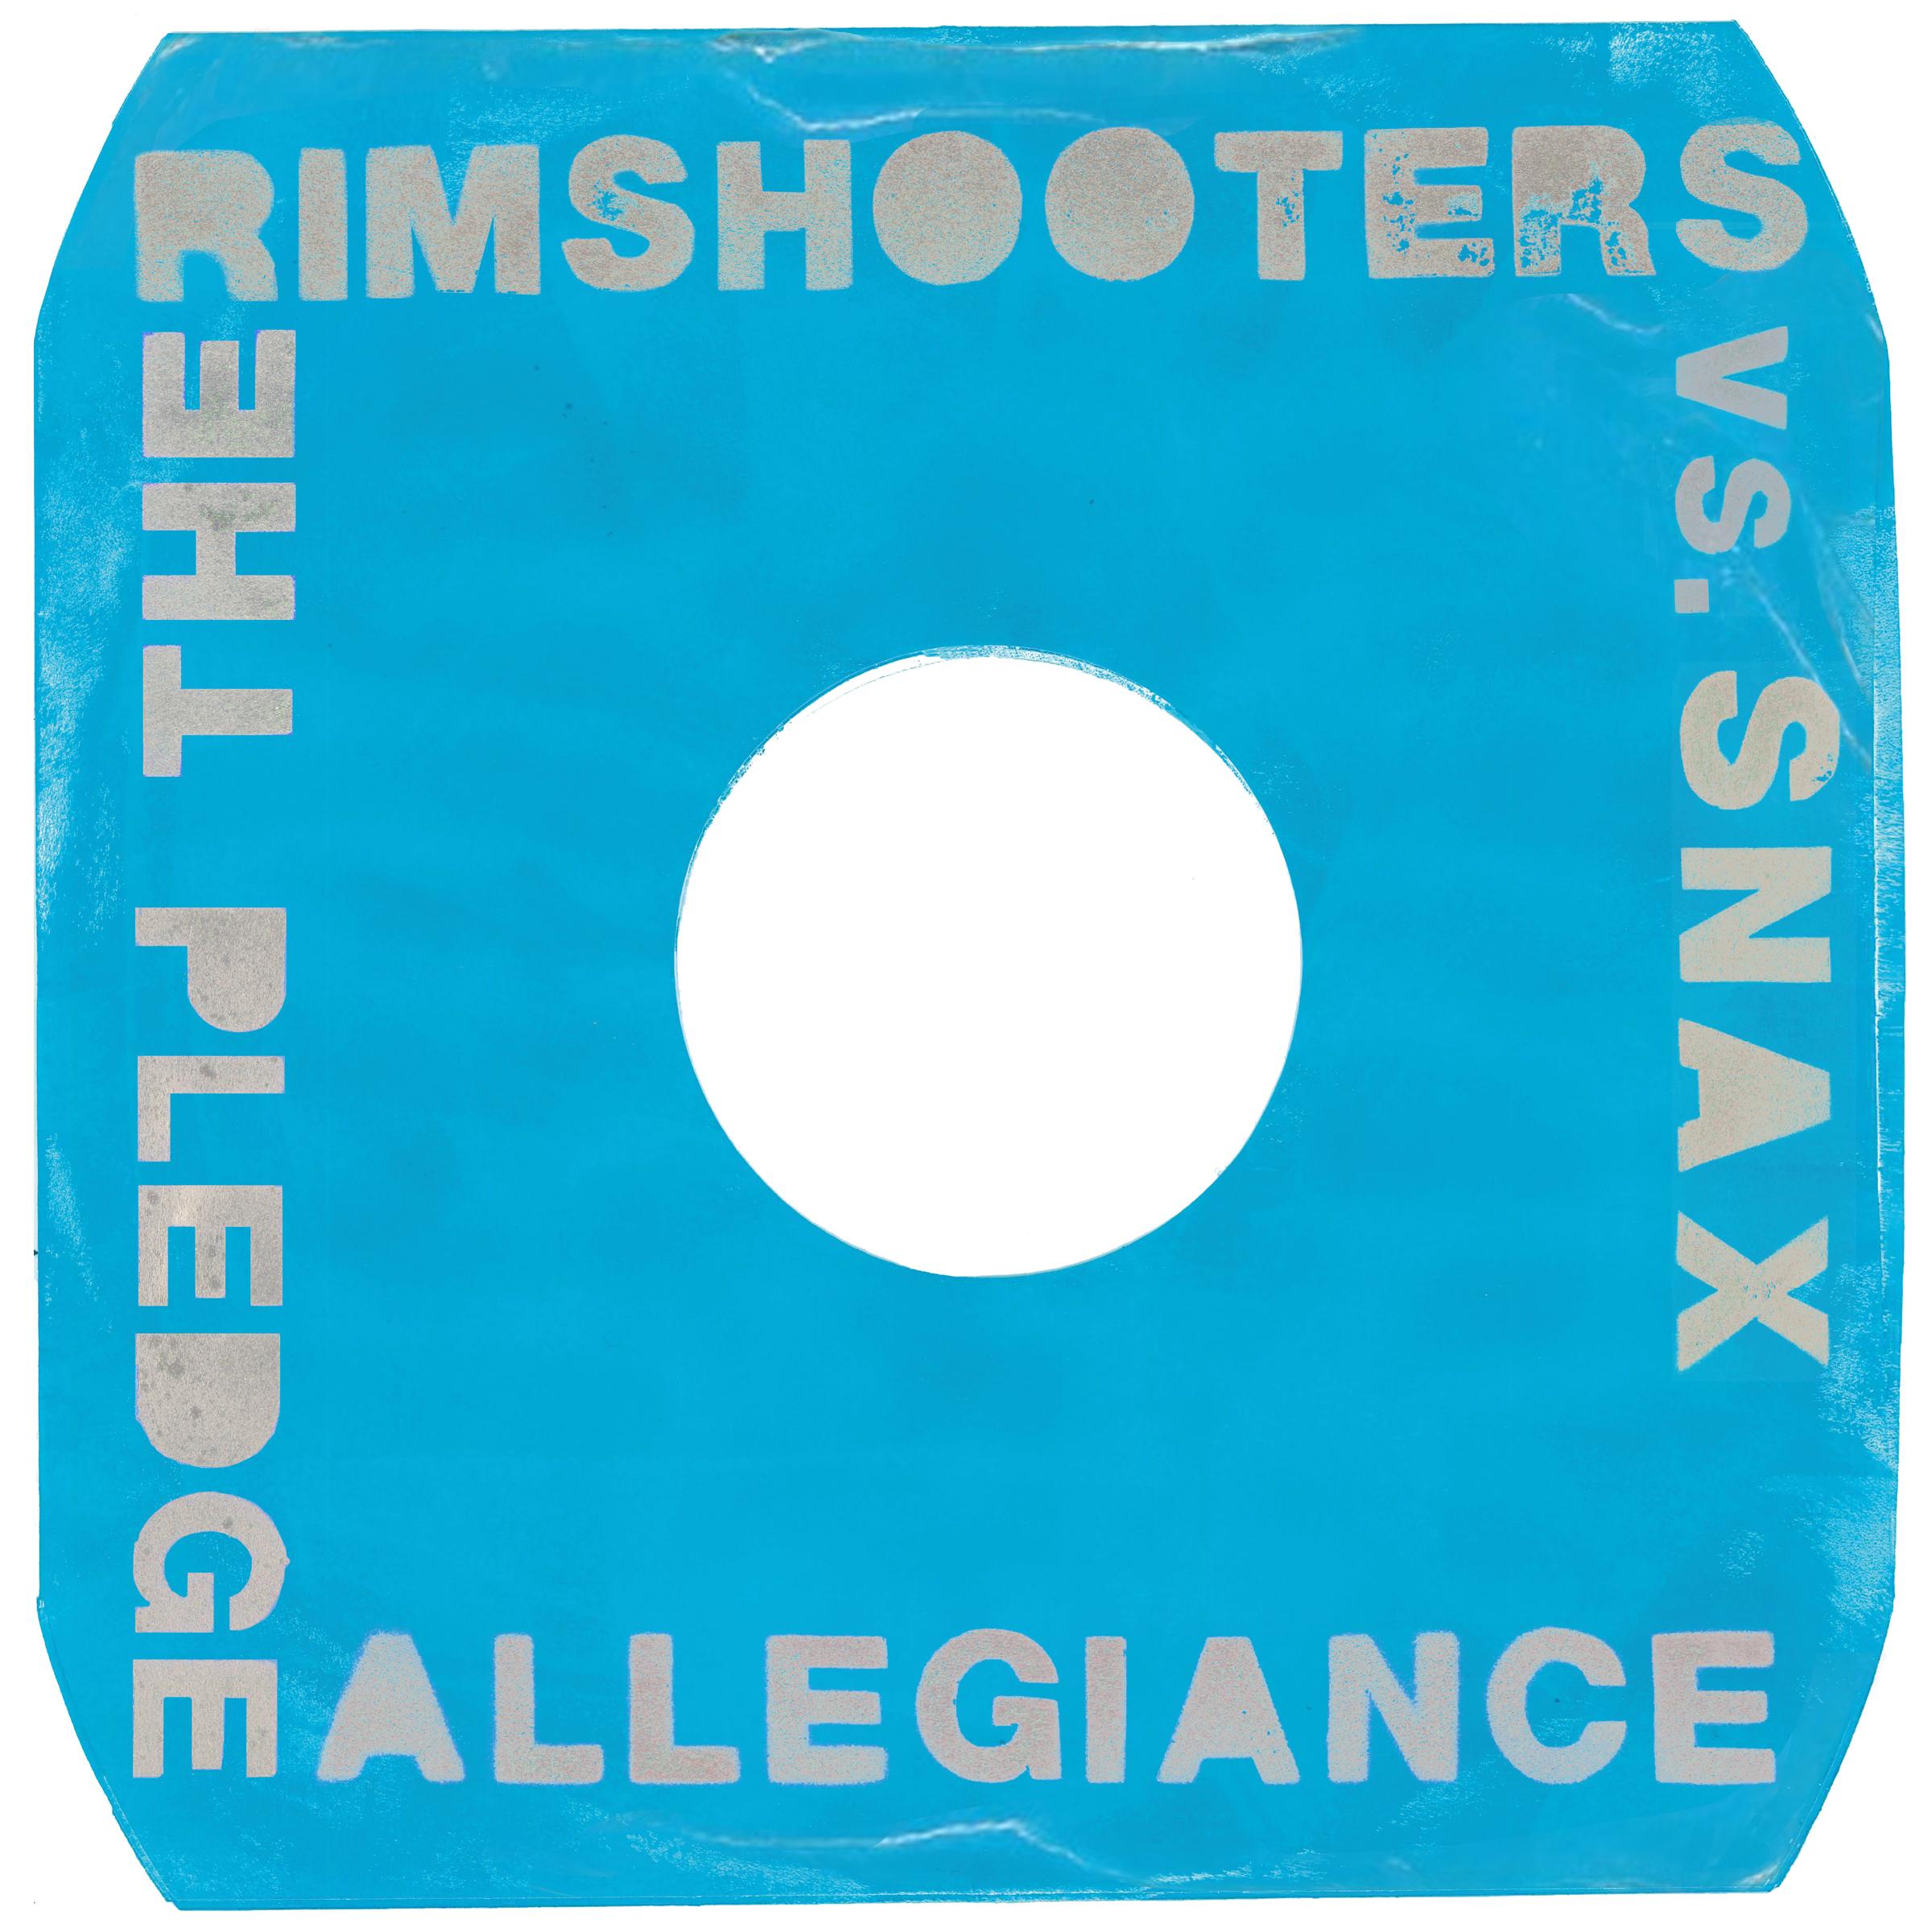 Pledge Allegiance - The Rimshooters vs. Snax